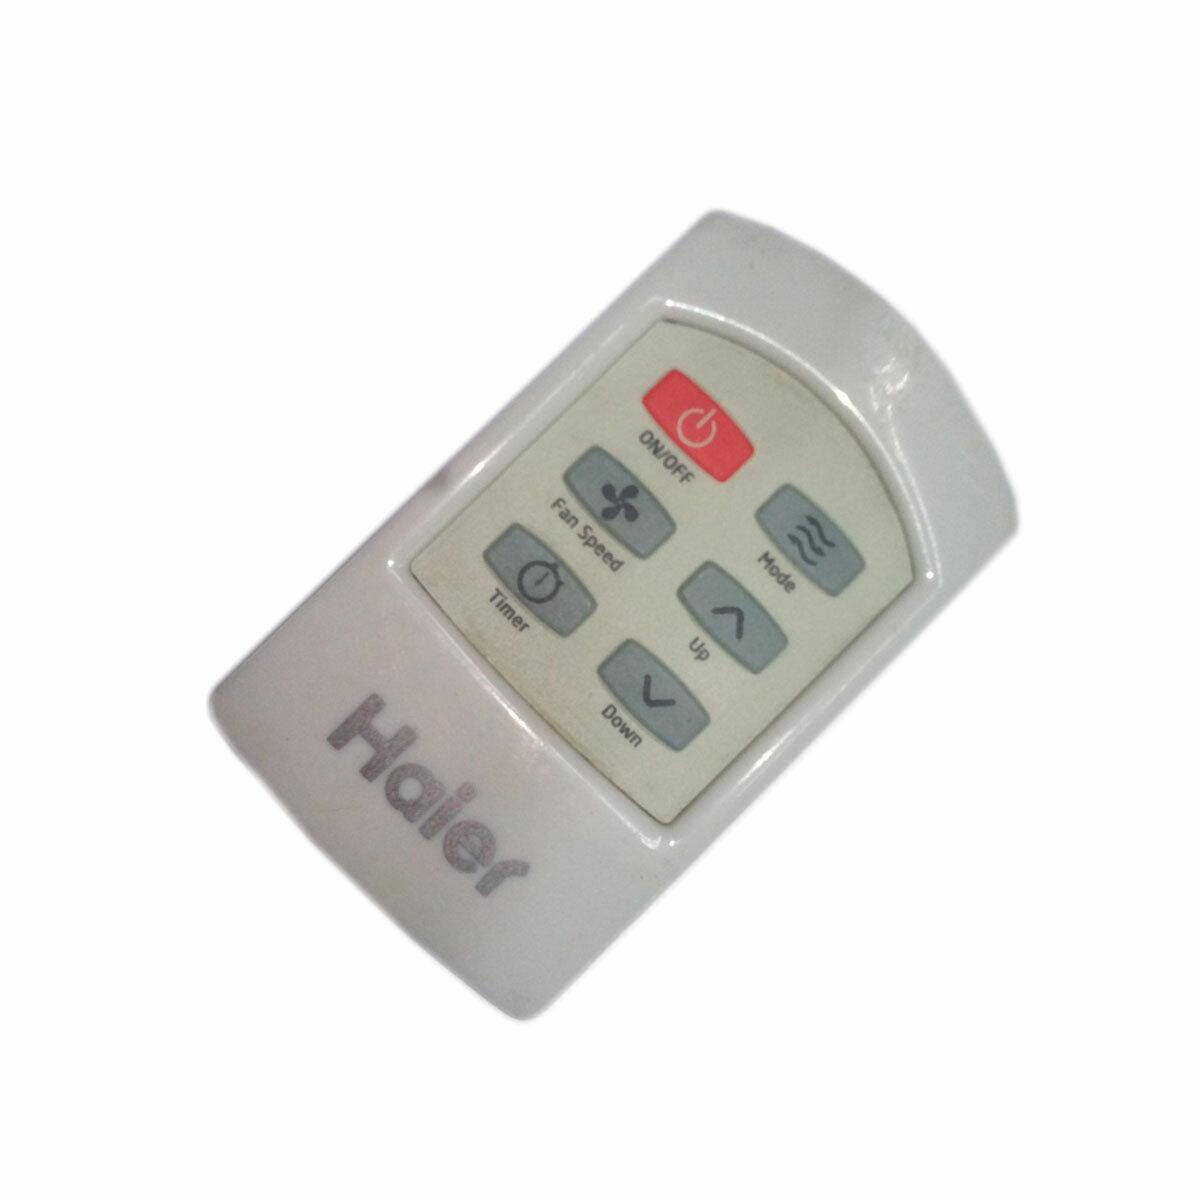 Original HAIER Air Conditioner Remote Control  for CPRB07XC7